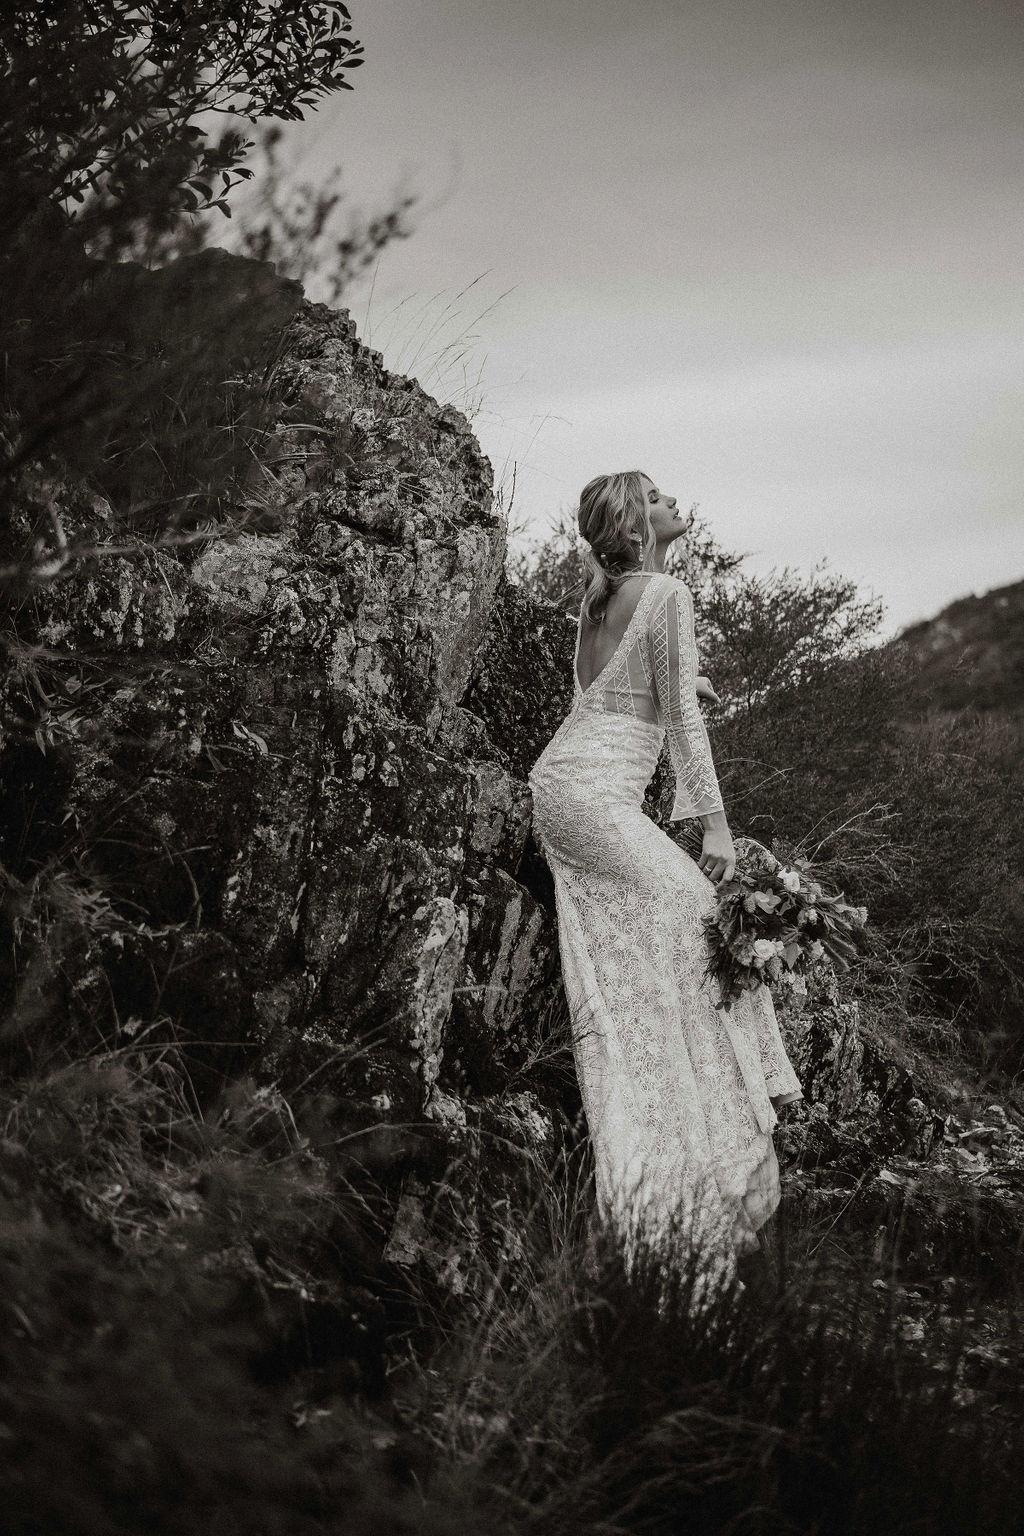 sunshine-coast-wedding-photography-terri-hanlon-photography-sunshine-brides-suncoast-flowers-allira-ashwell-137-2